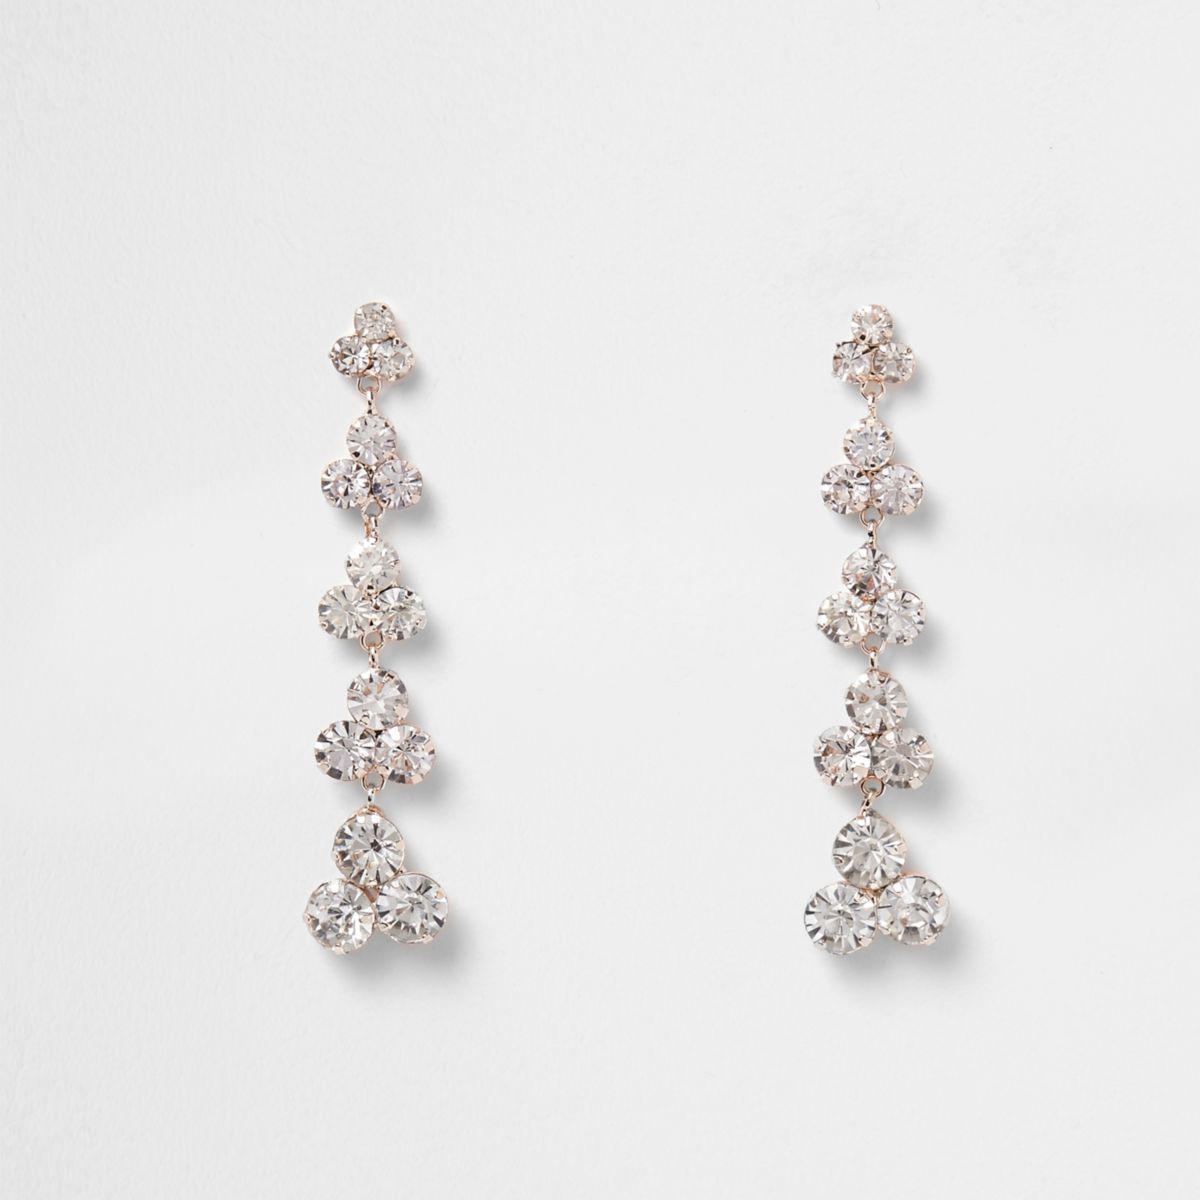 8372af9cb27a6 River Island Metallic Rose Gold Tone Rhinestone Dangle Earrings Rose Gold  Tone Rhinestone Dangle Earrings